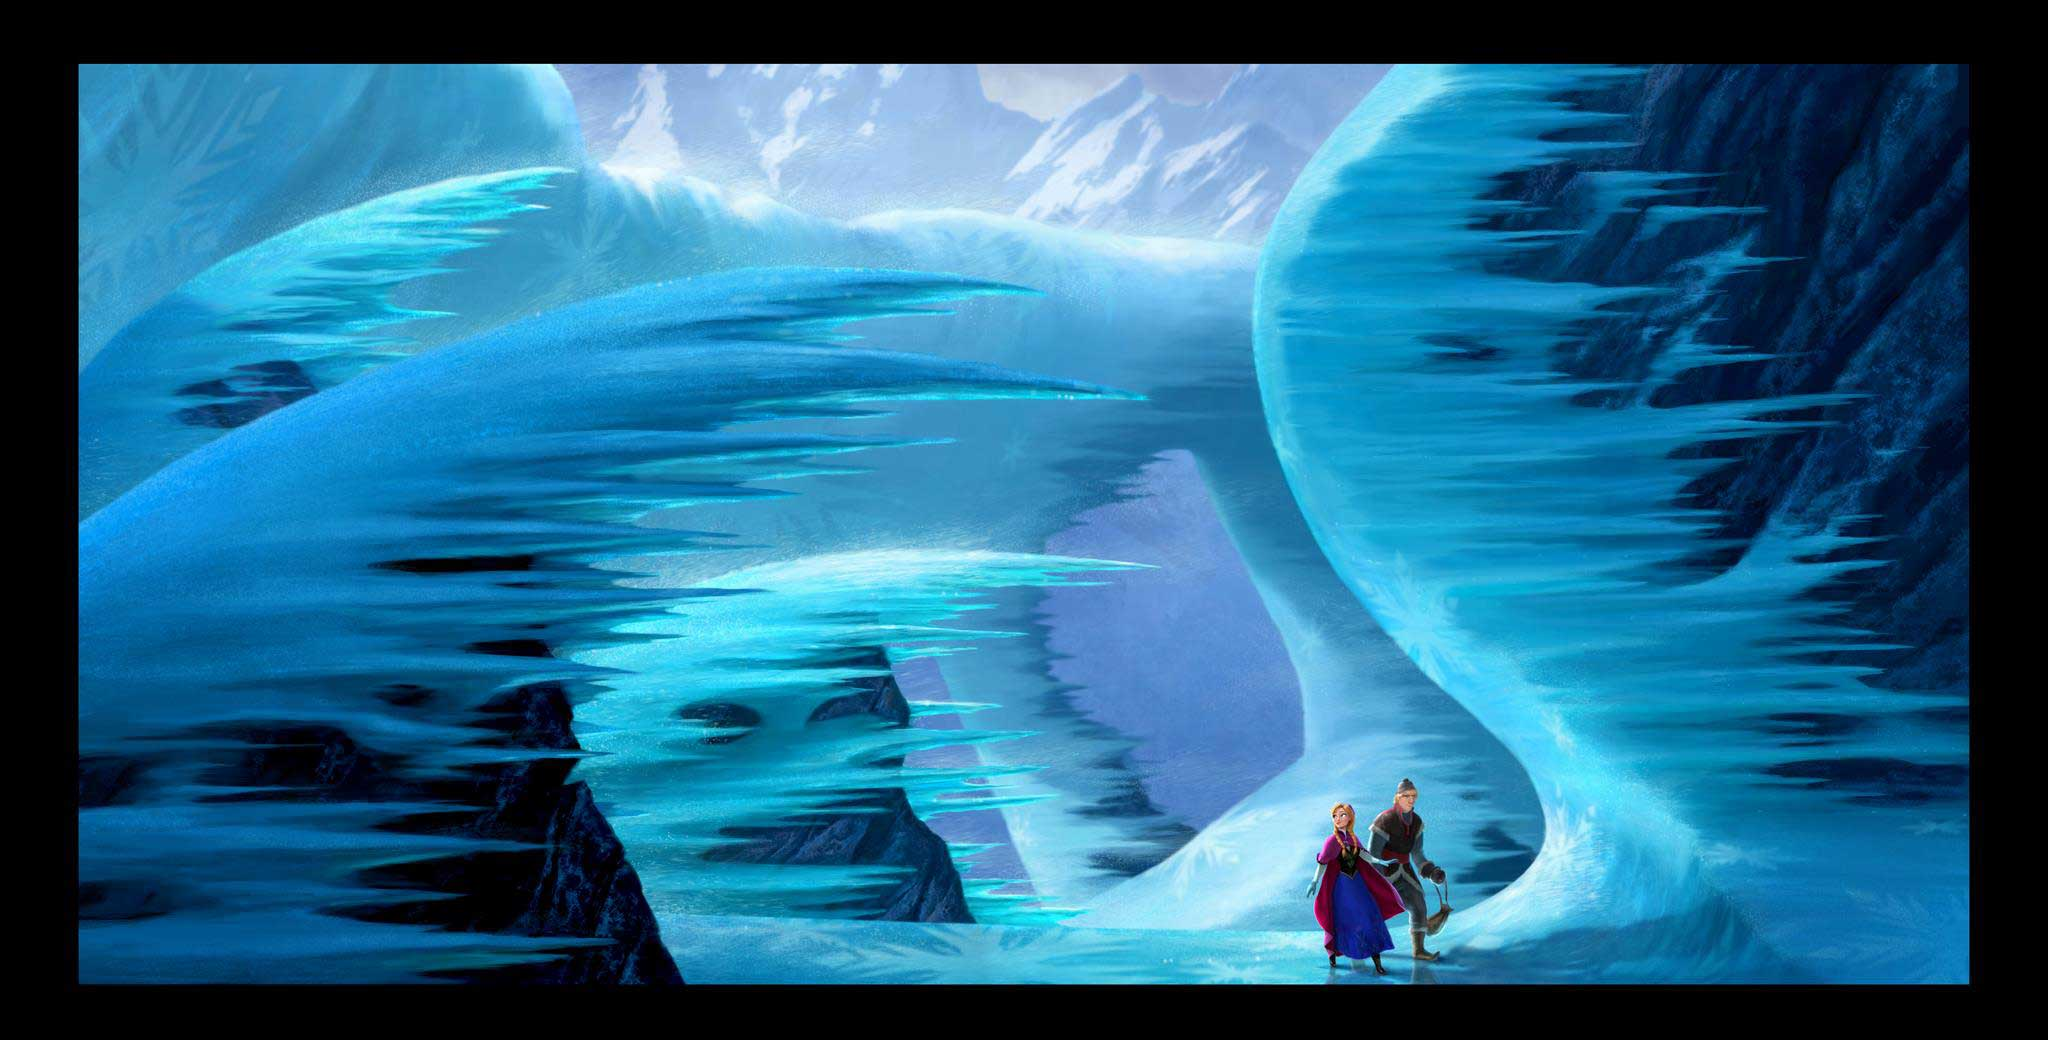 Disney Frozen Wallpapers Desktop Backgrounds HD Frozen Movie 2048x1040